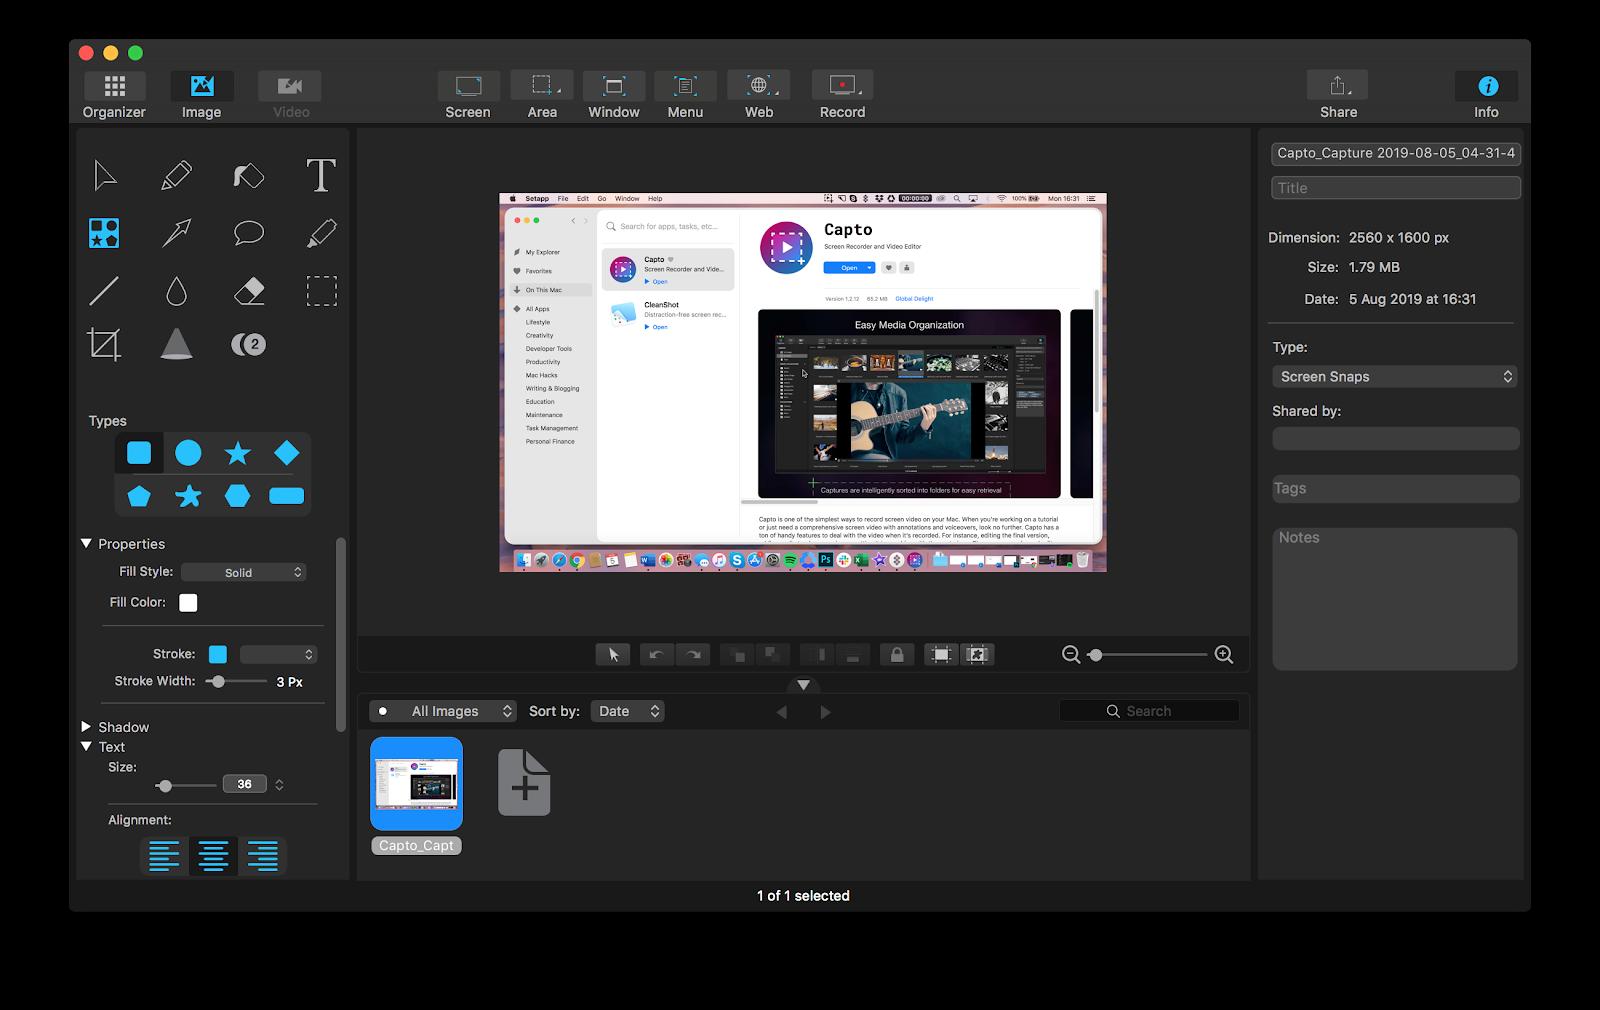 Capto app for screenshot and screen records editing